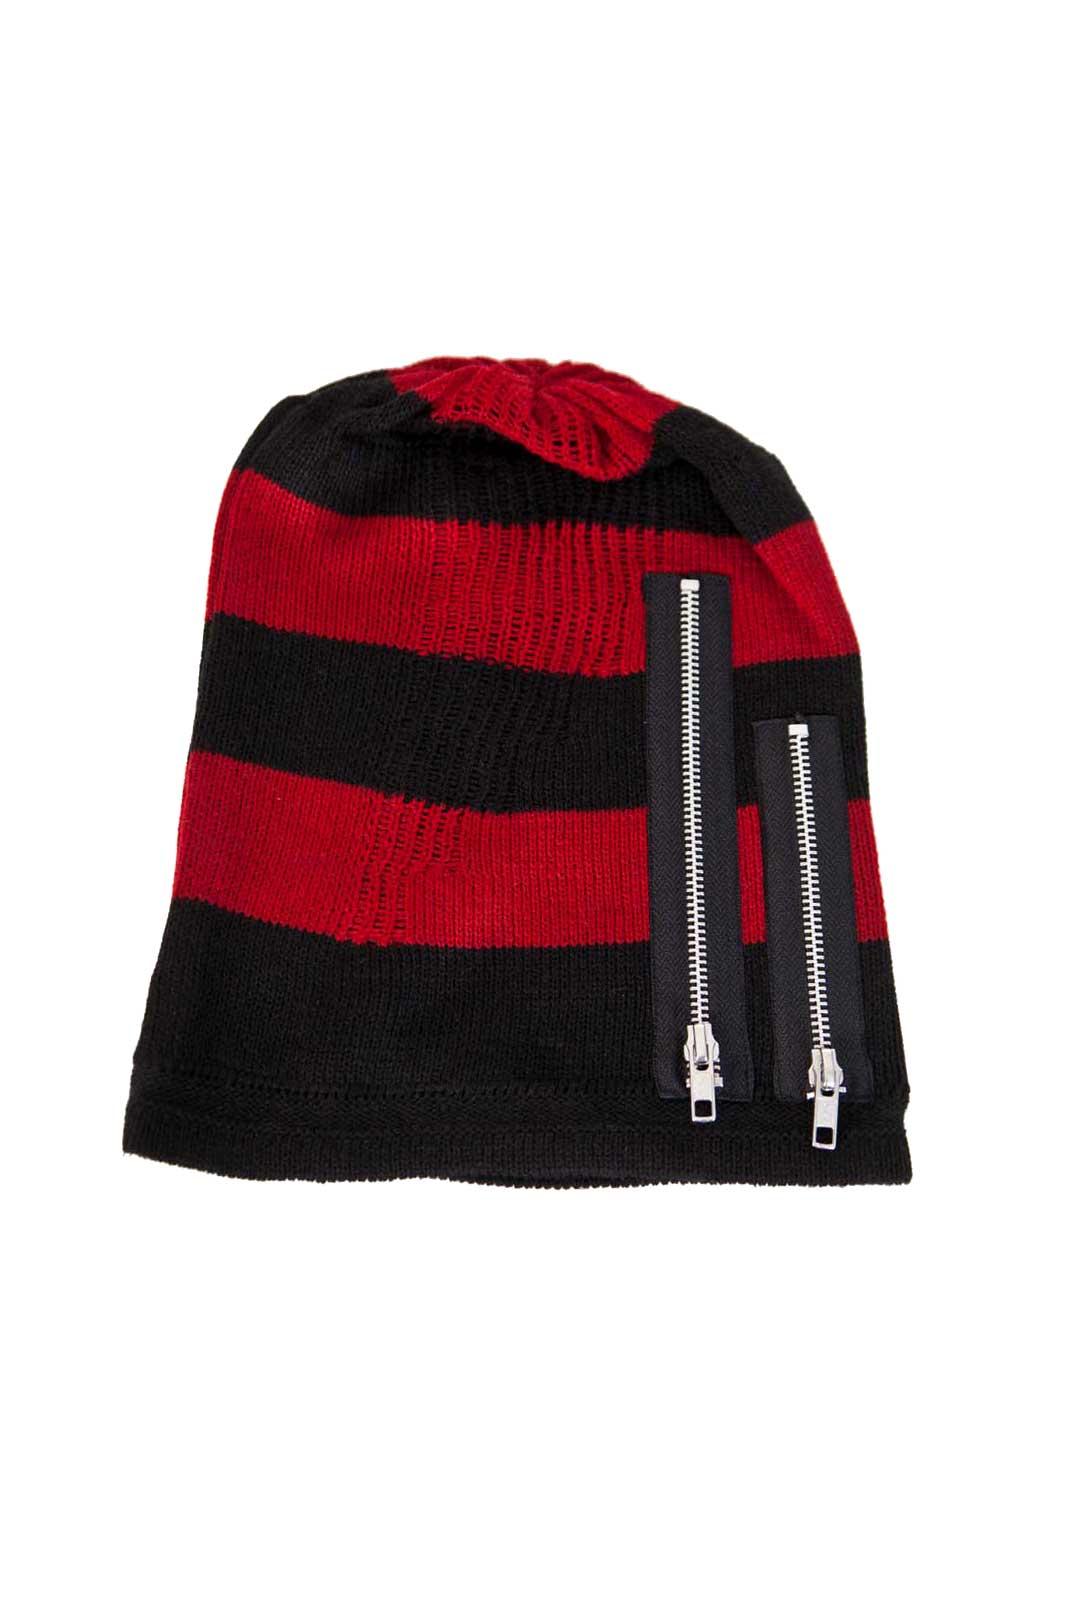 Krueger Hat Black & Red